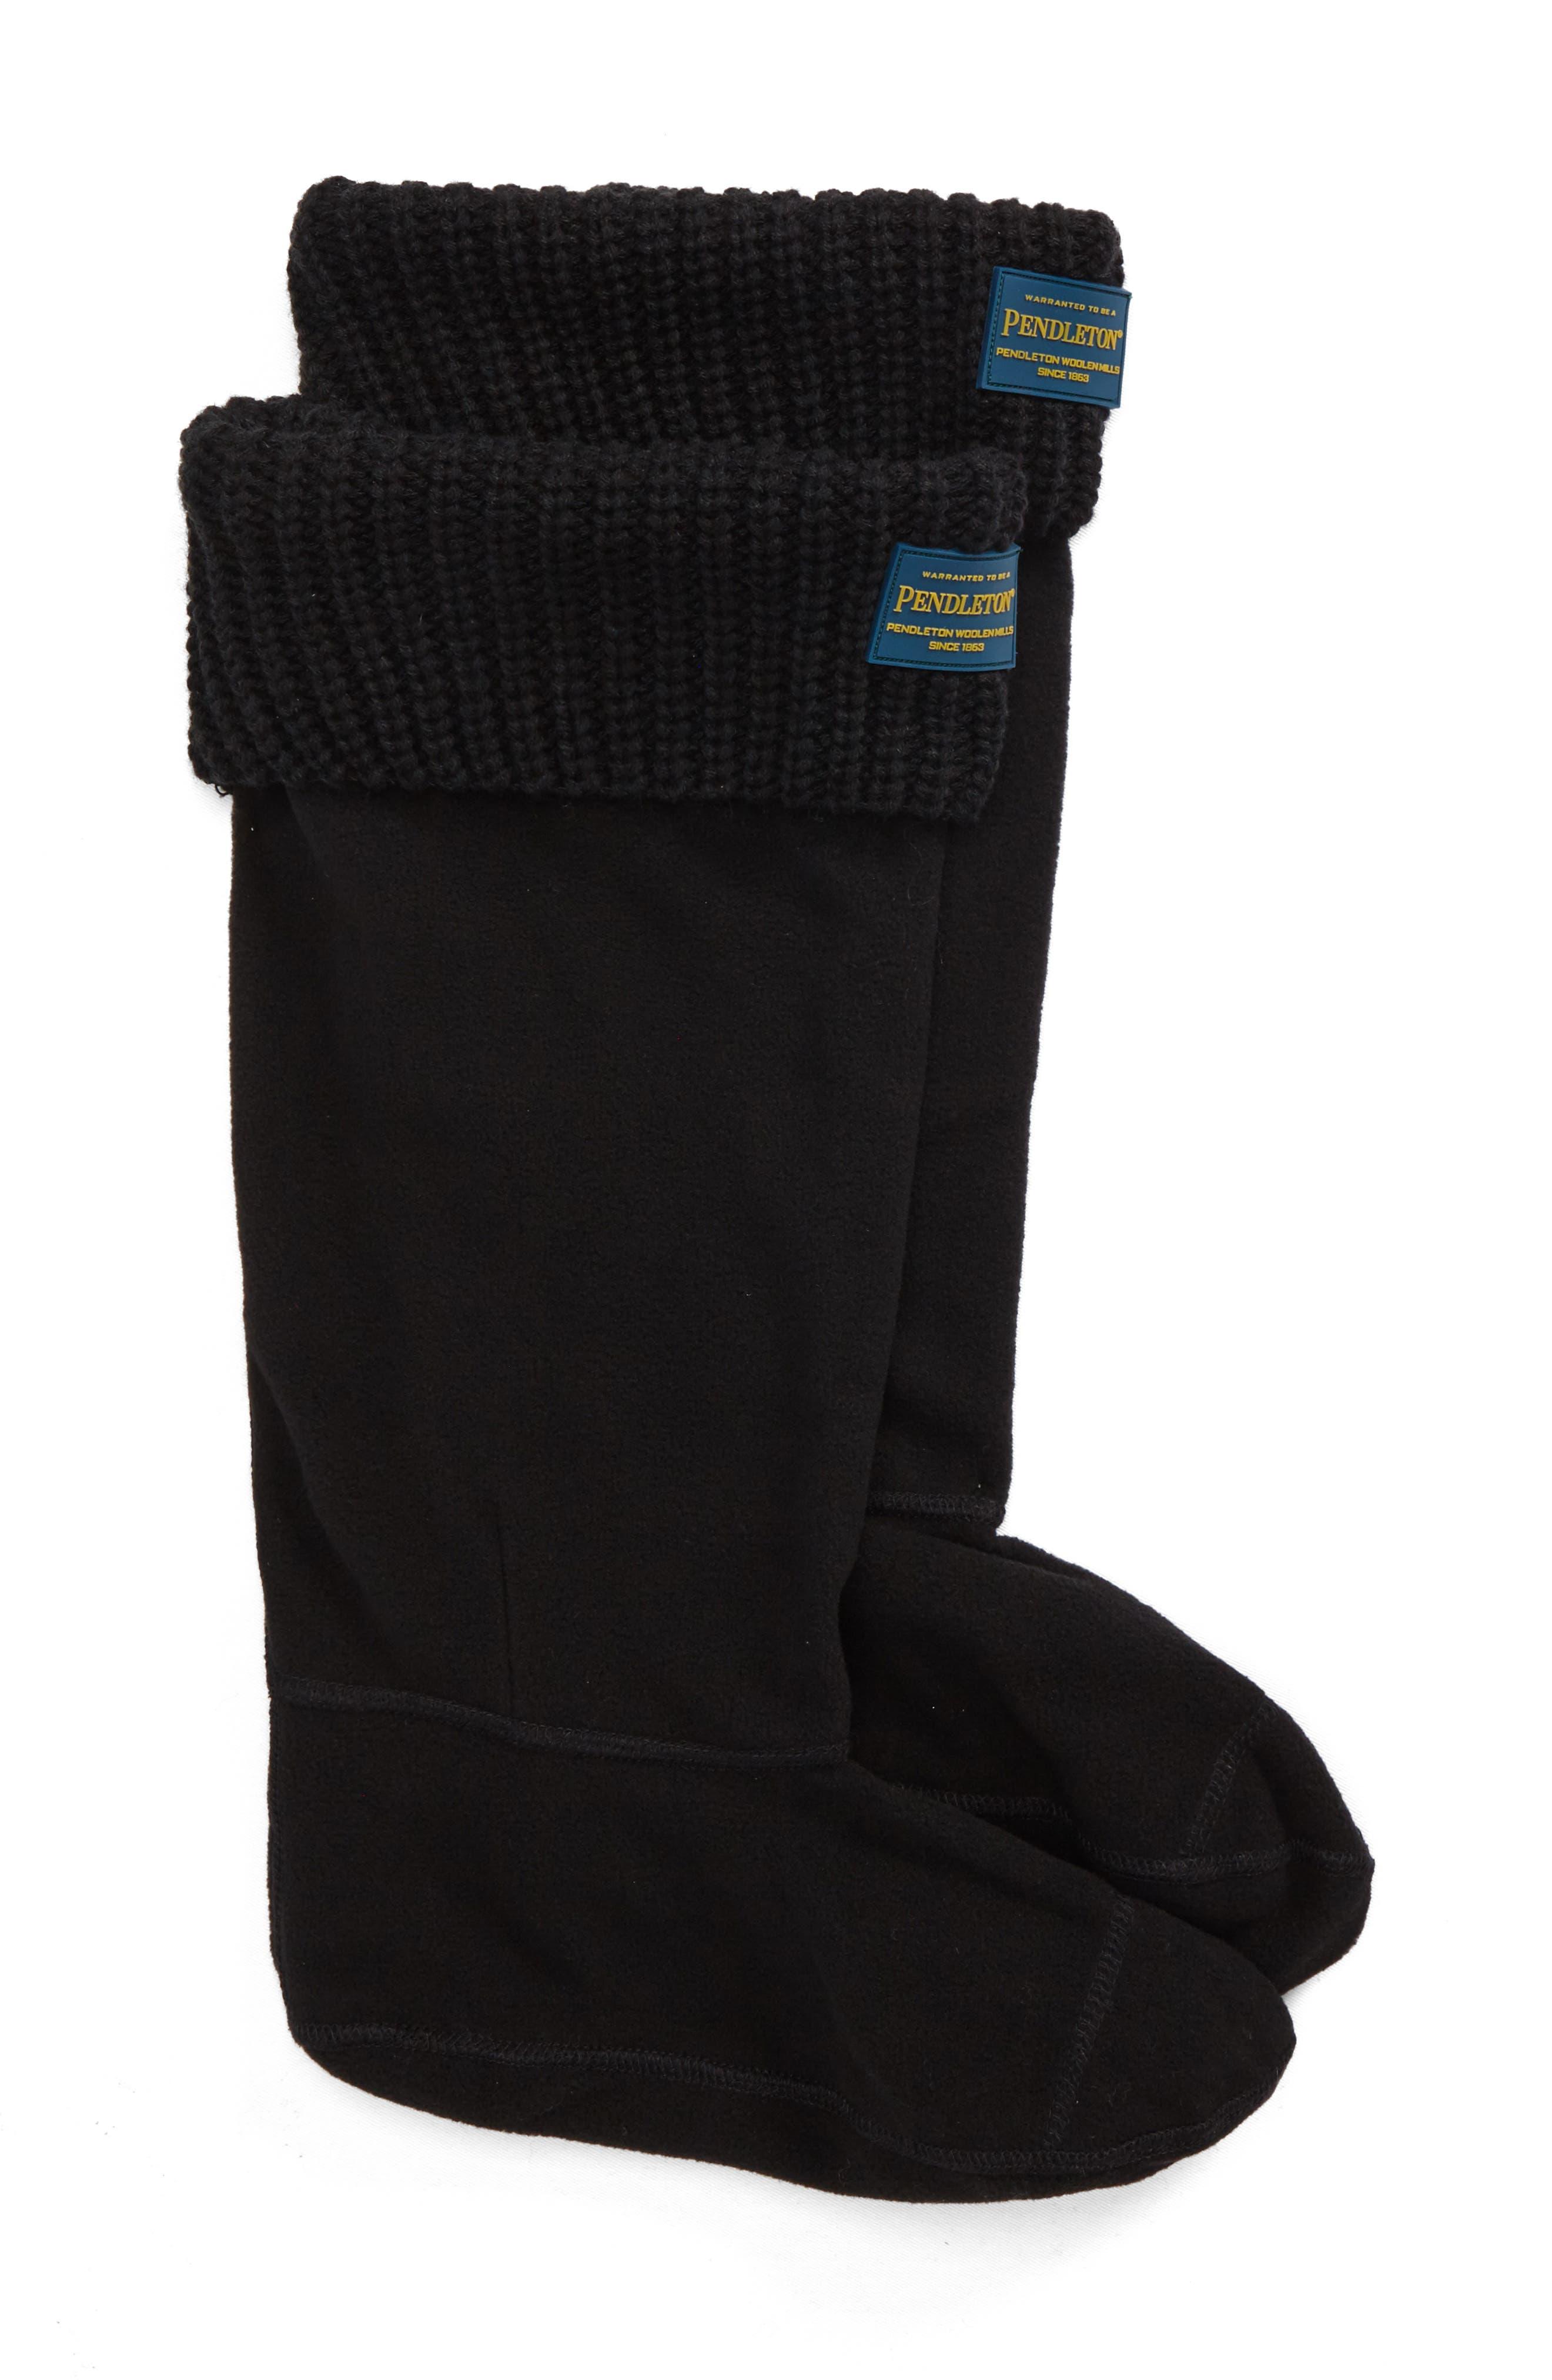 Pendleton Shaker Stitch Tall Boot Socks (Women)